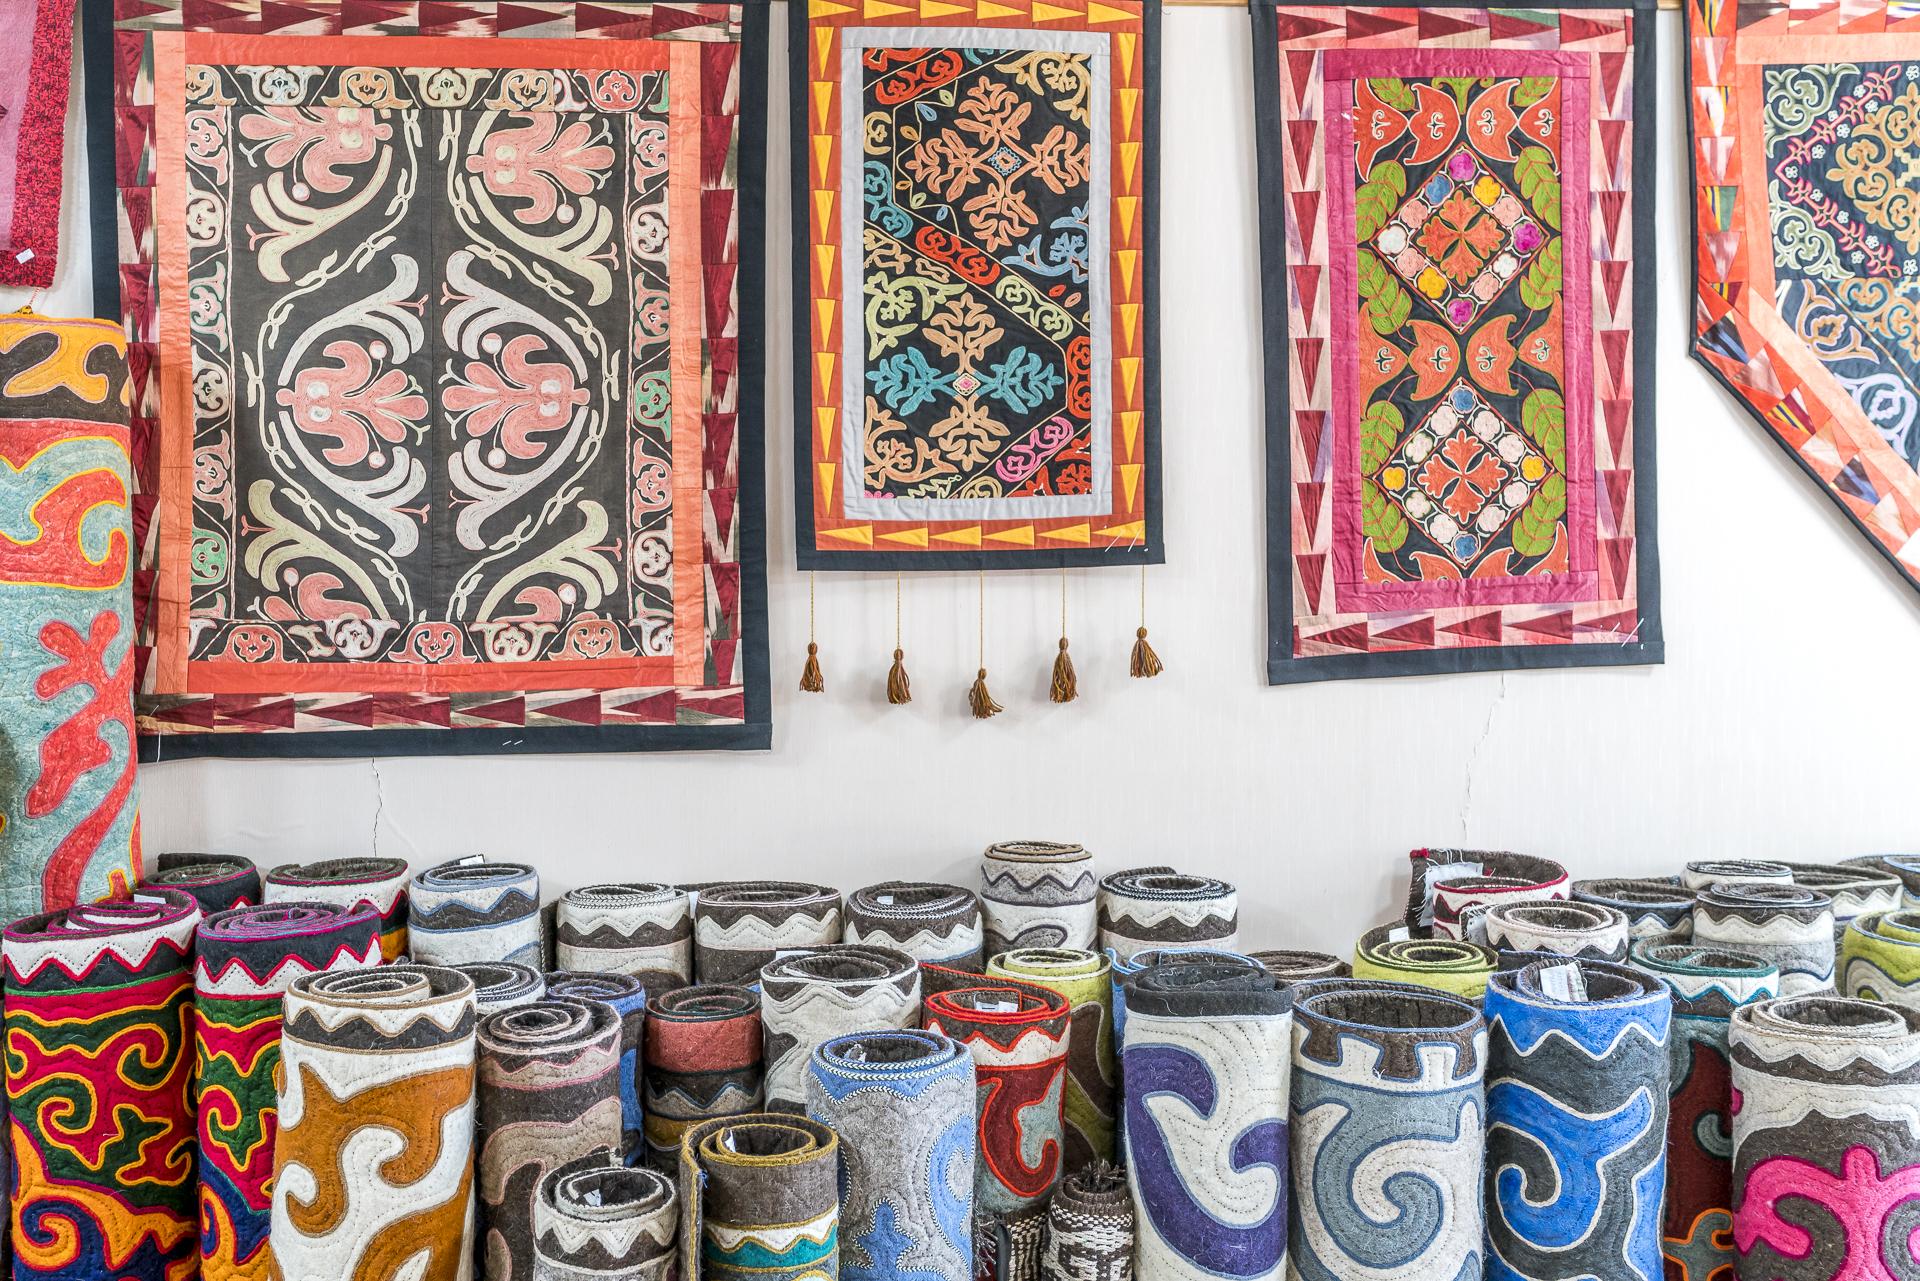 Filzteppiche in Kirgistan